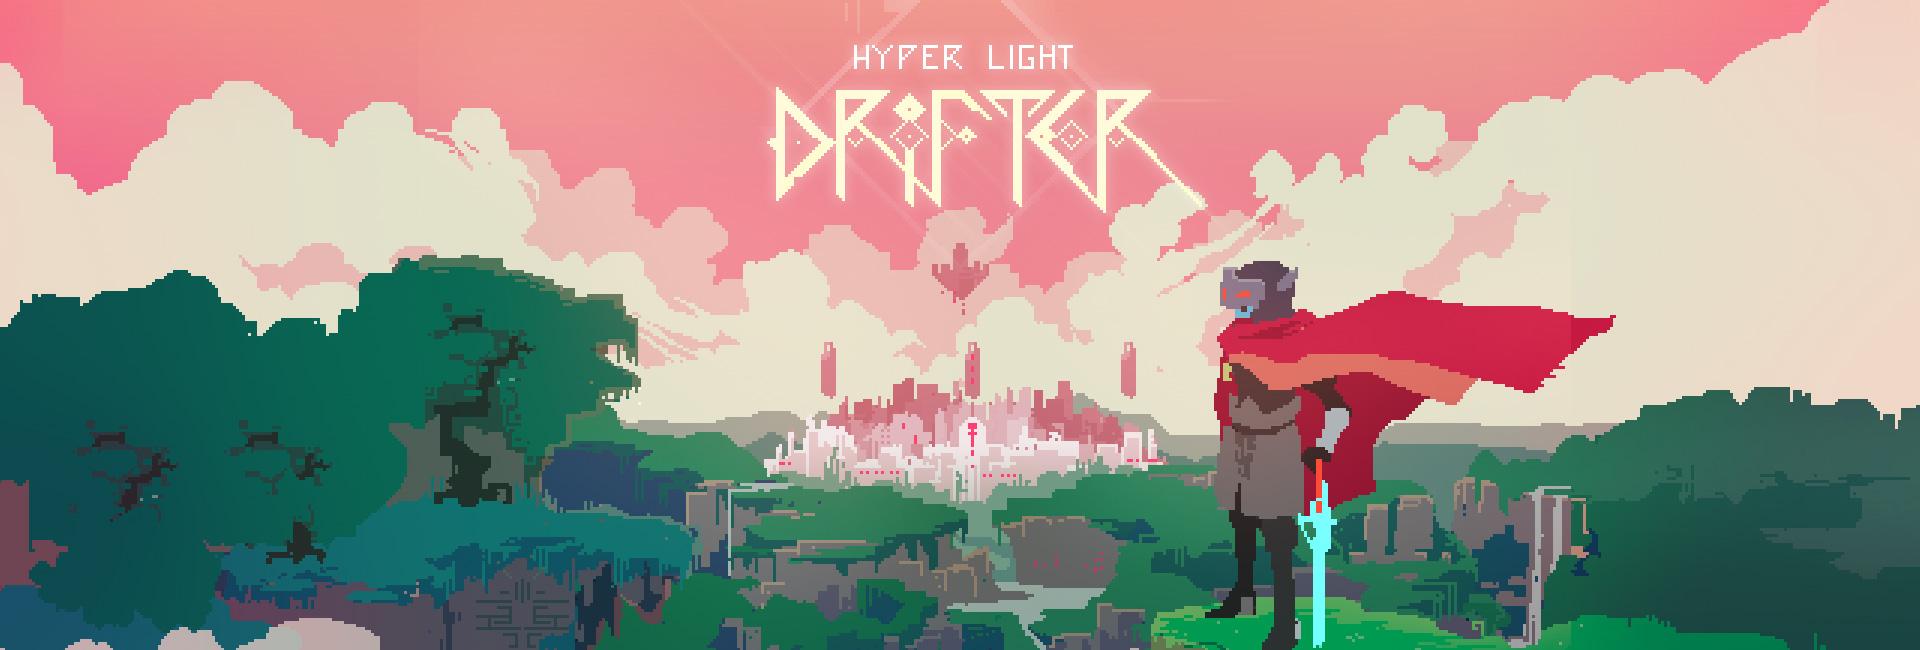 HQ Hyper Light Drifter Wallpapers | File 240.45Kb